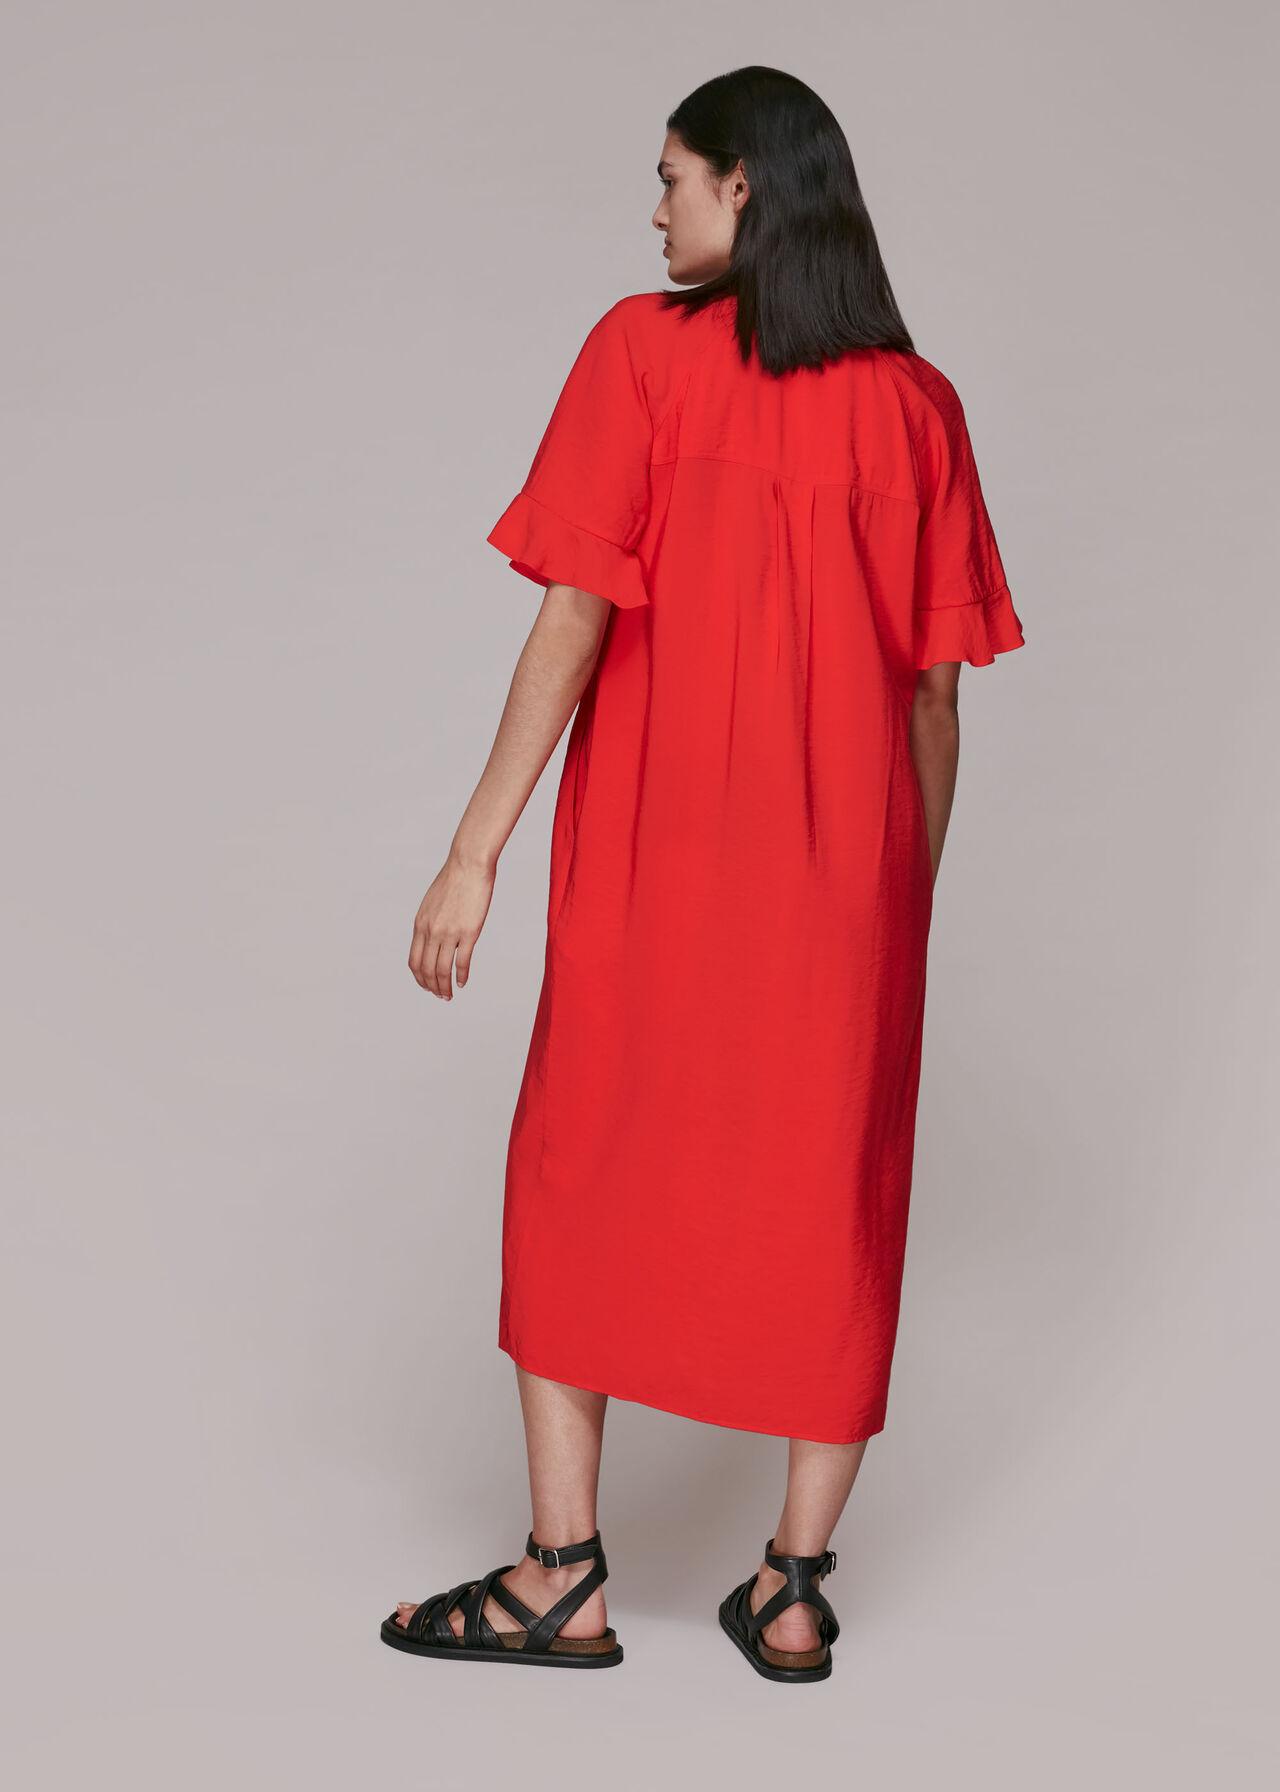 Alba Midi Dress